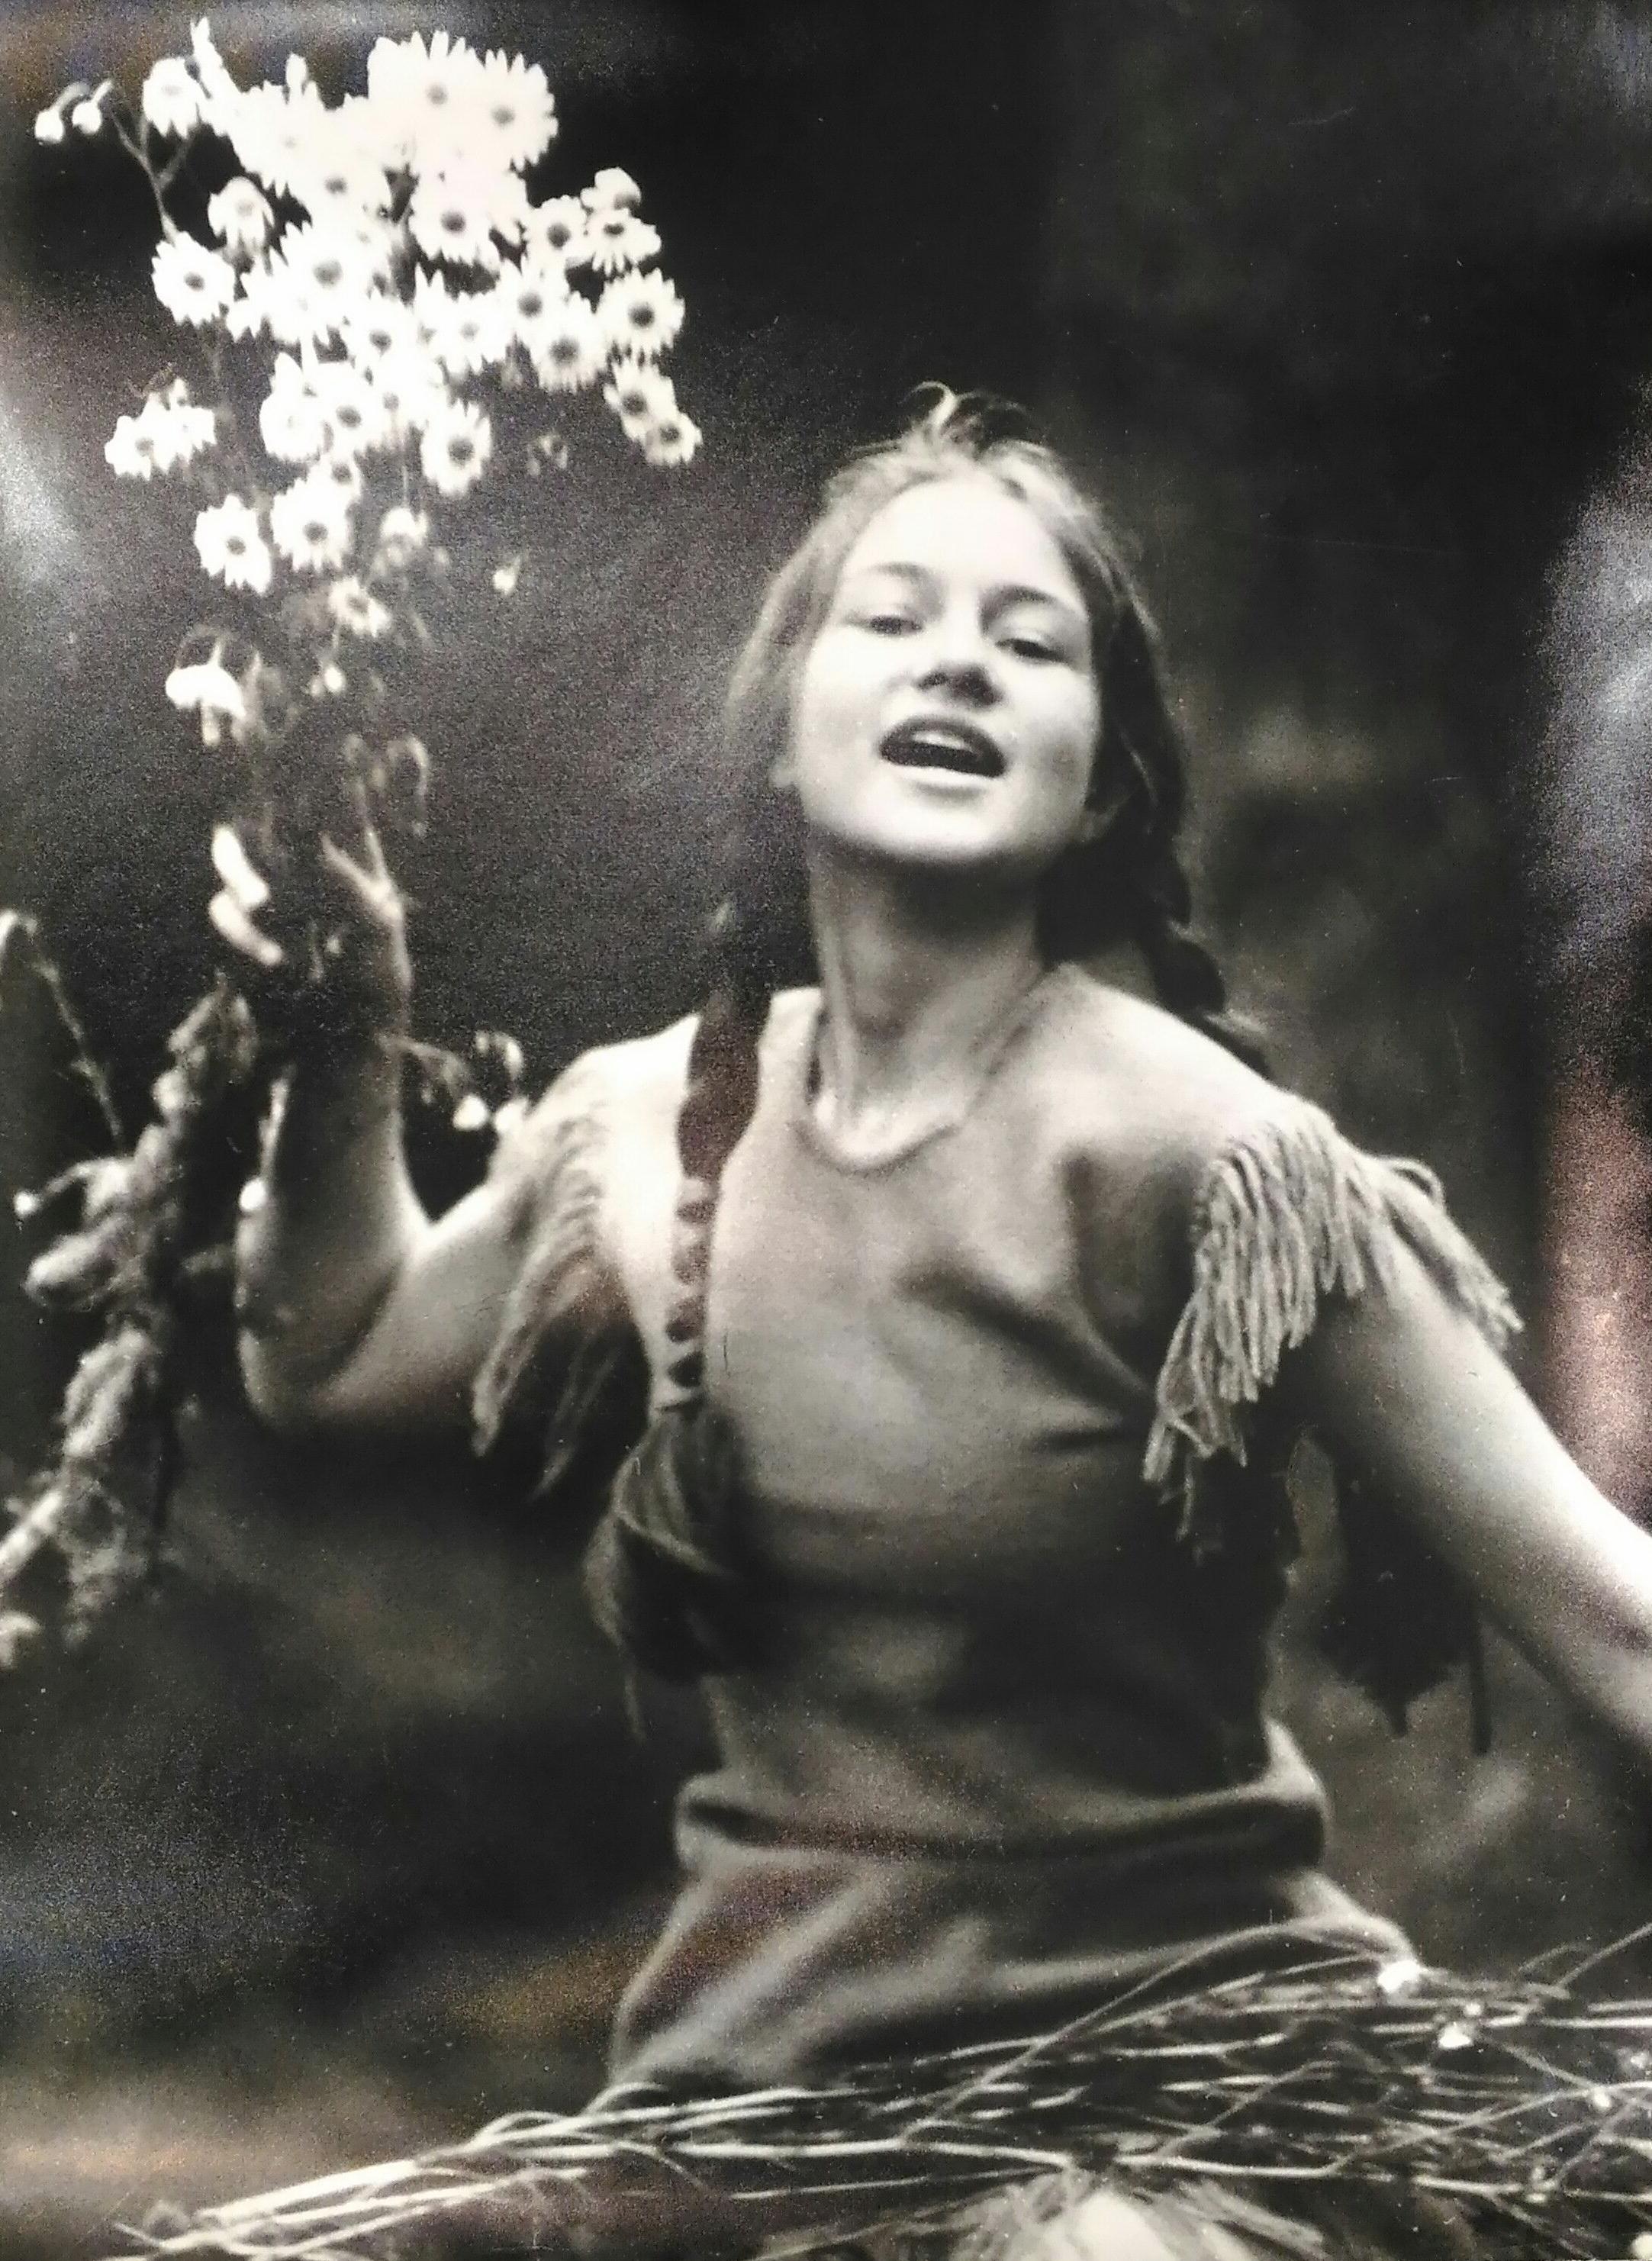 1970-е. Свиридова Н., Воздвиженский Д. «Девушка с ромашками»